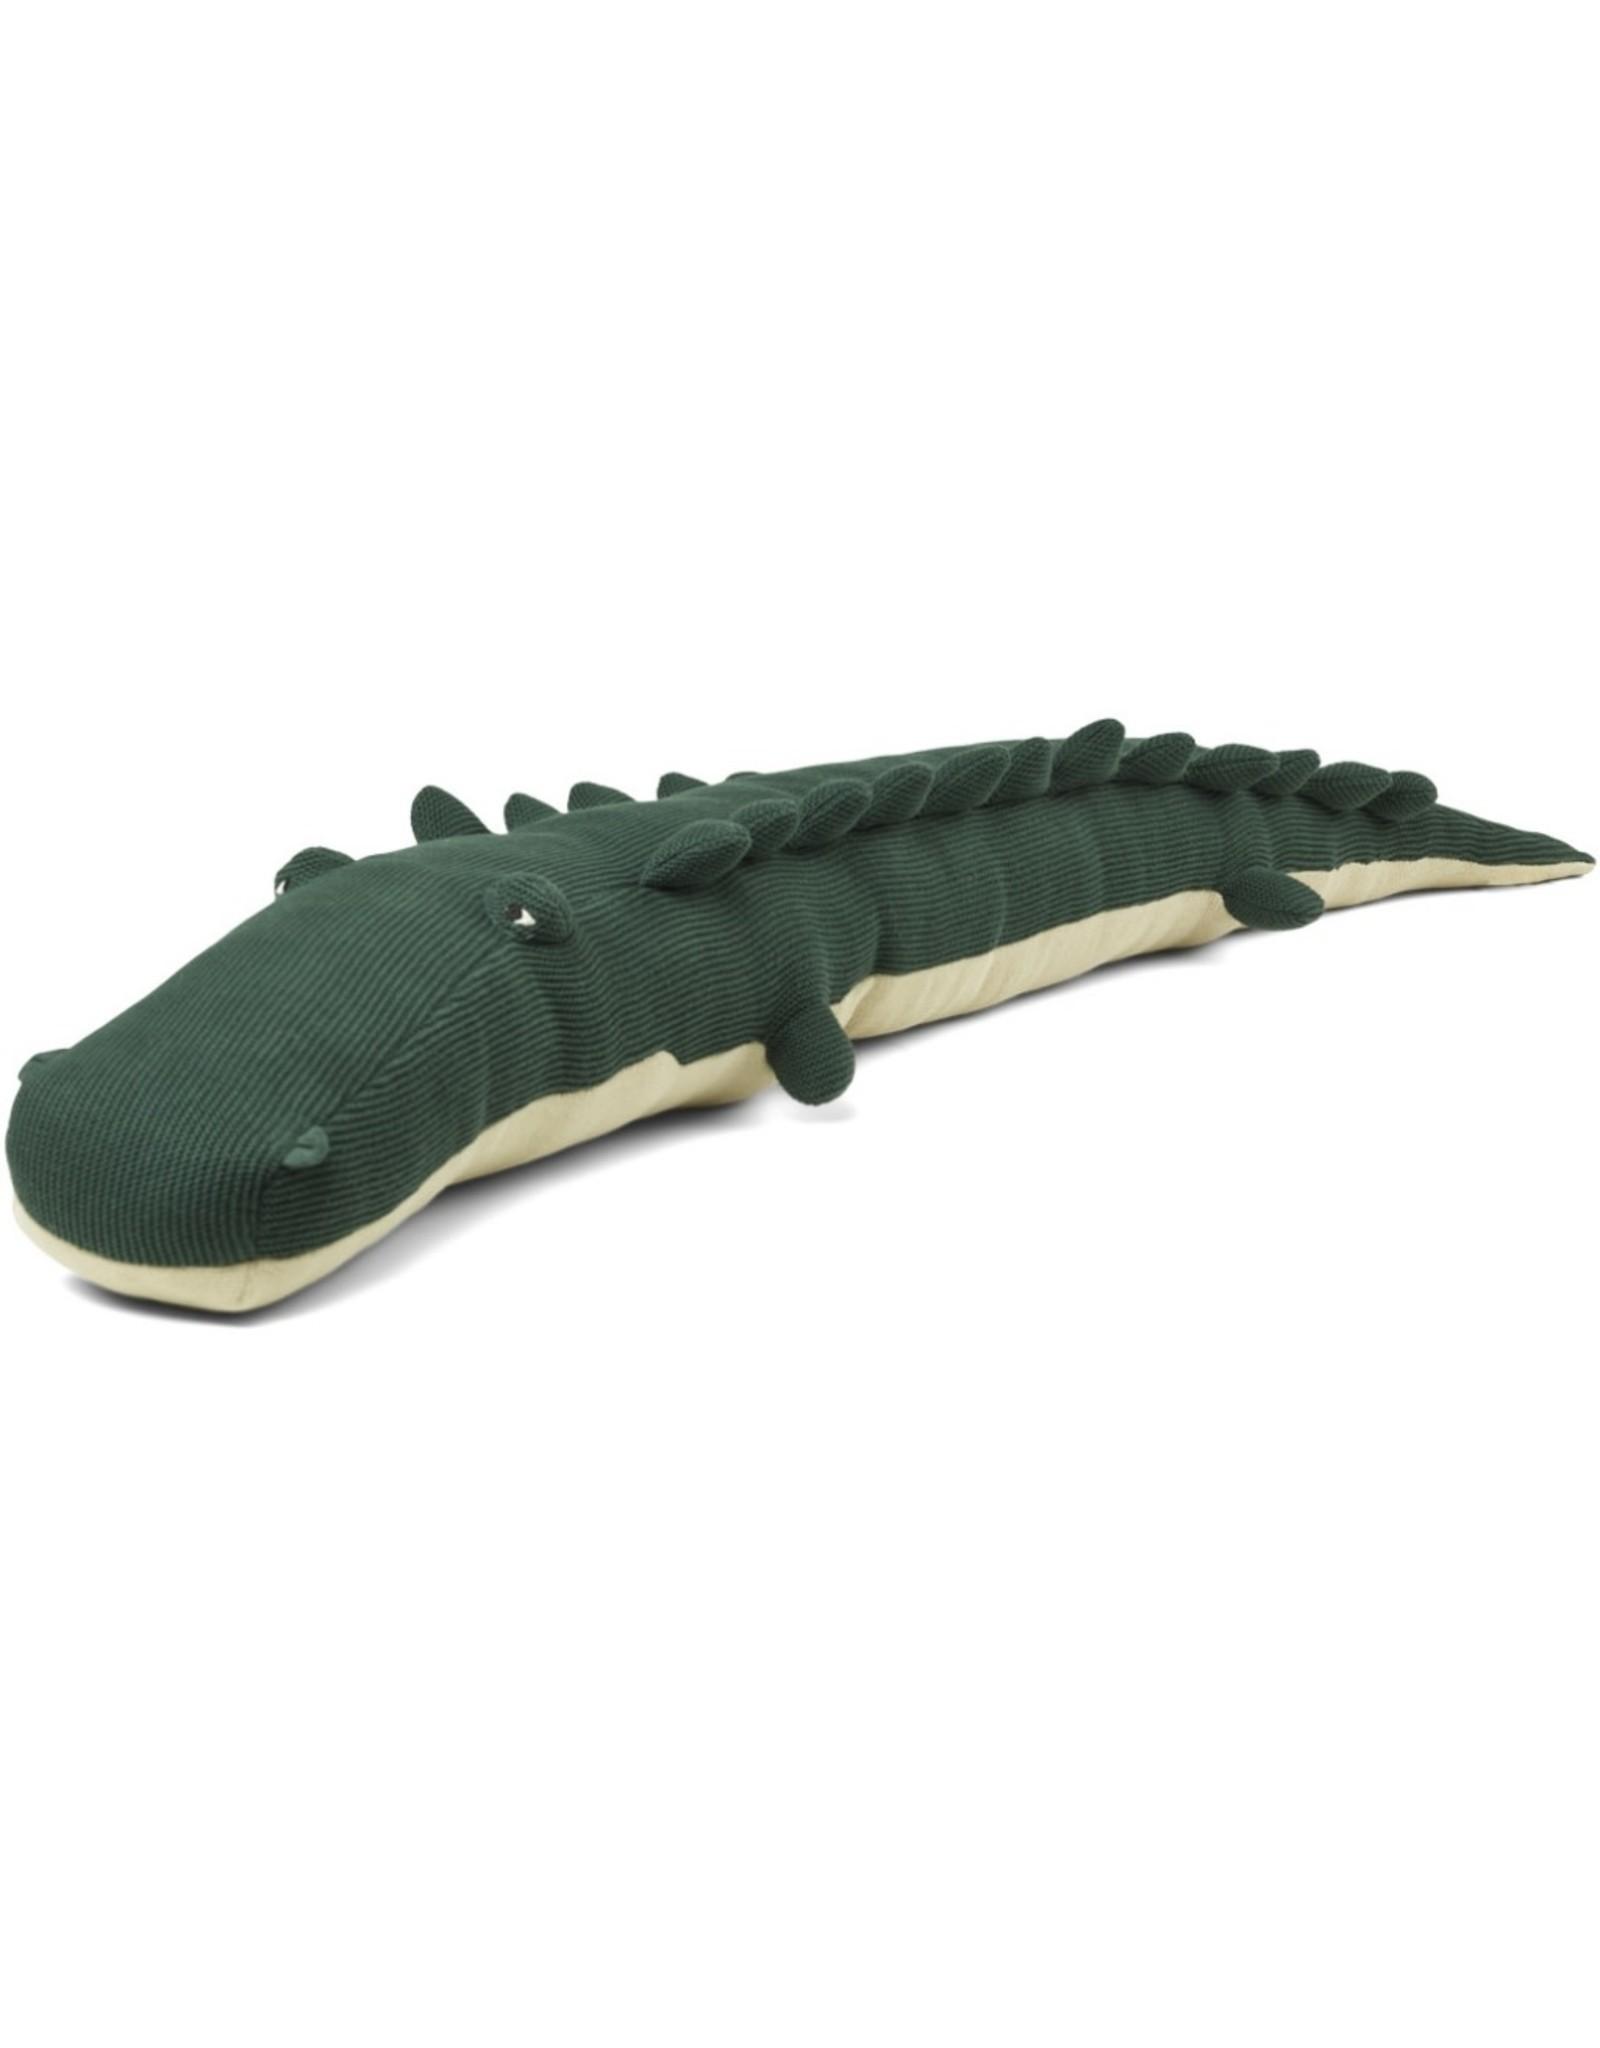 Liewood Carlos Crocodile - Crocodile Garden Green